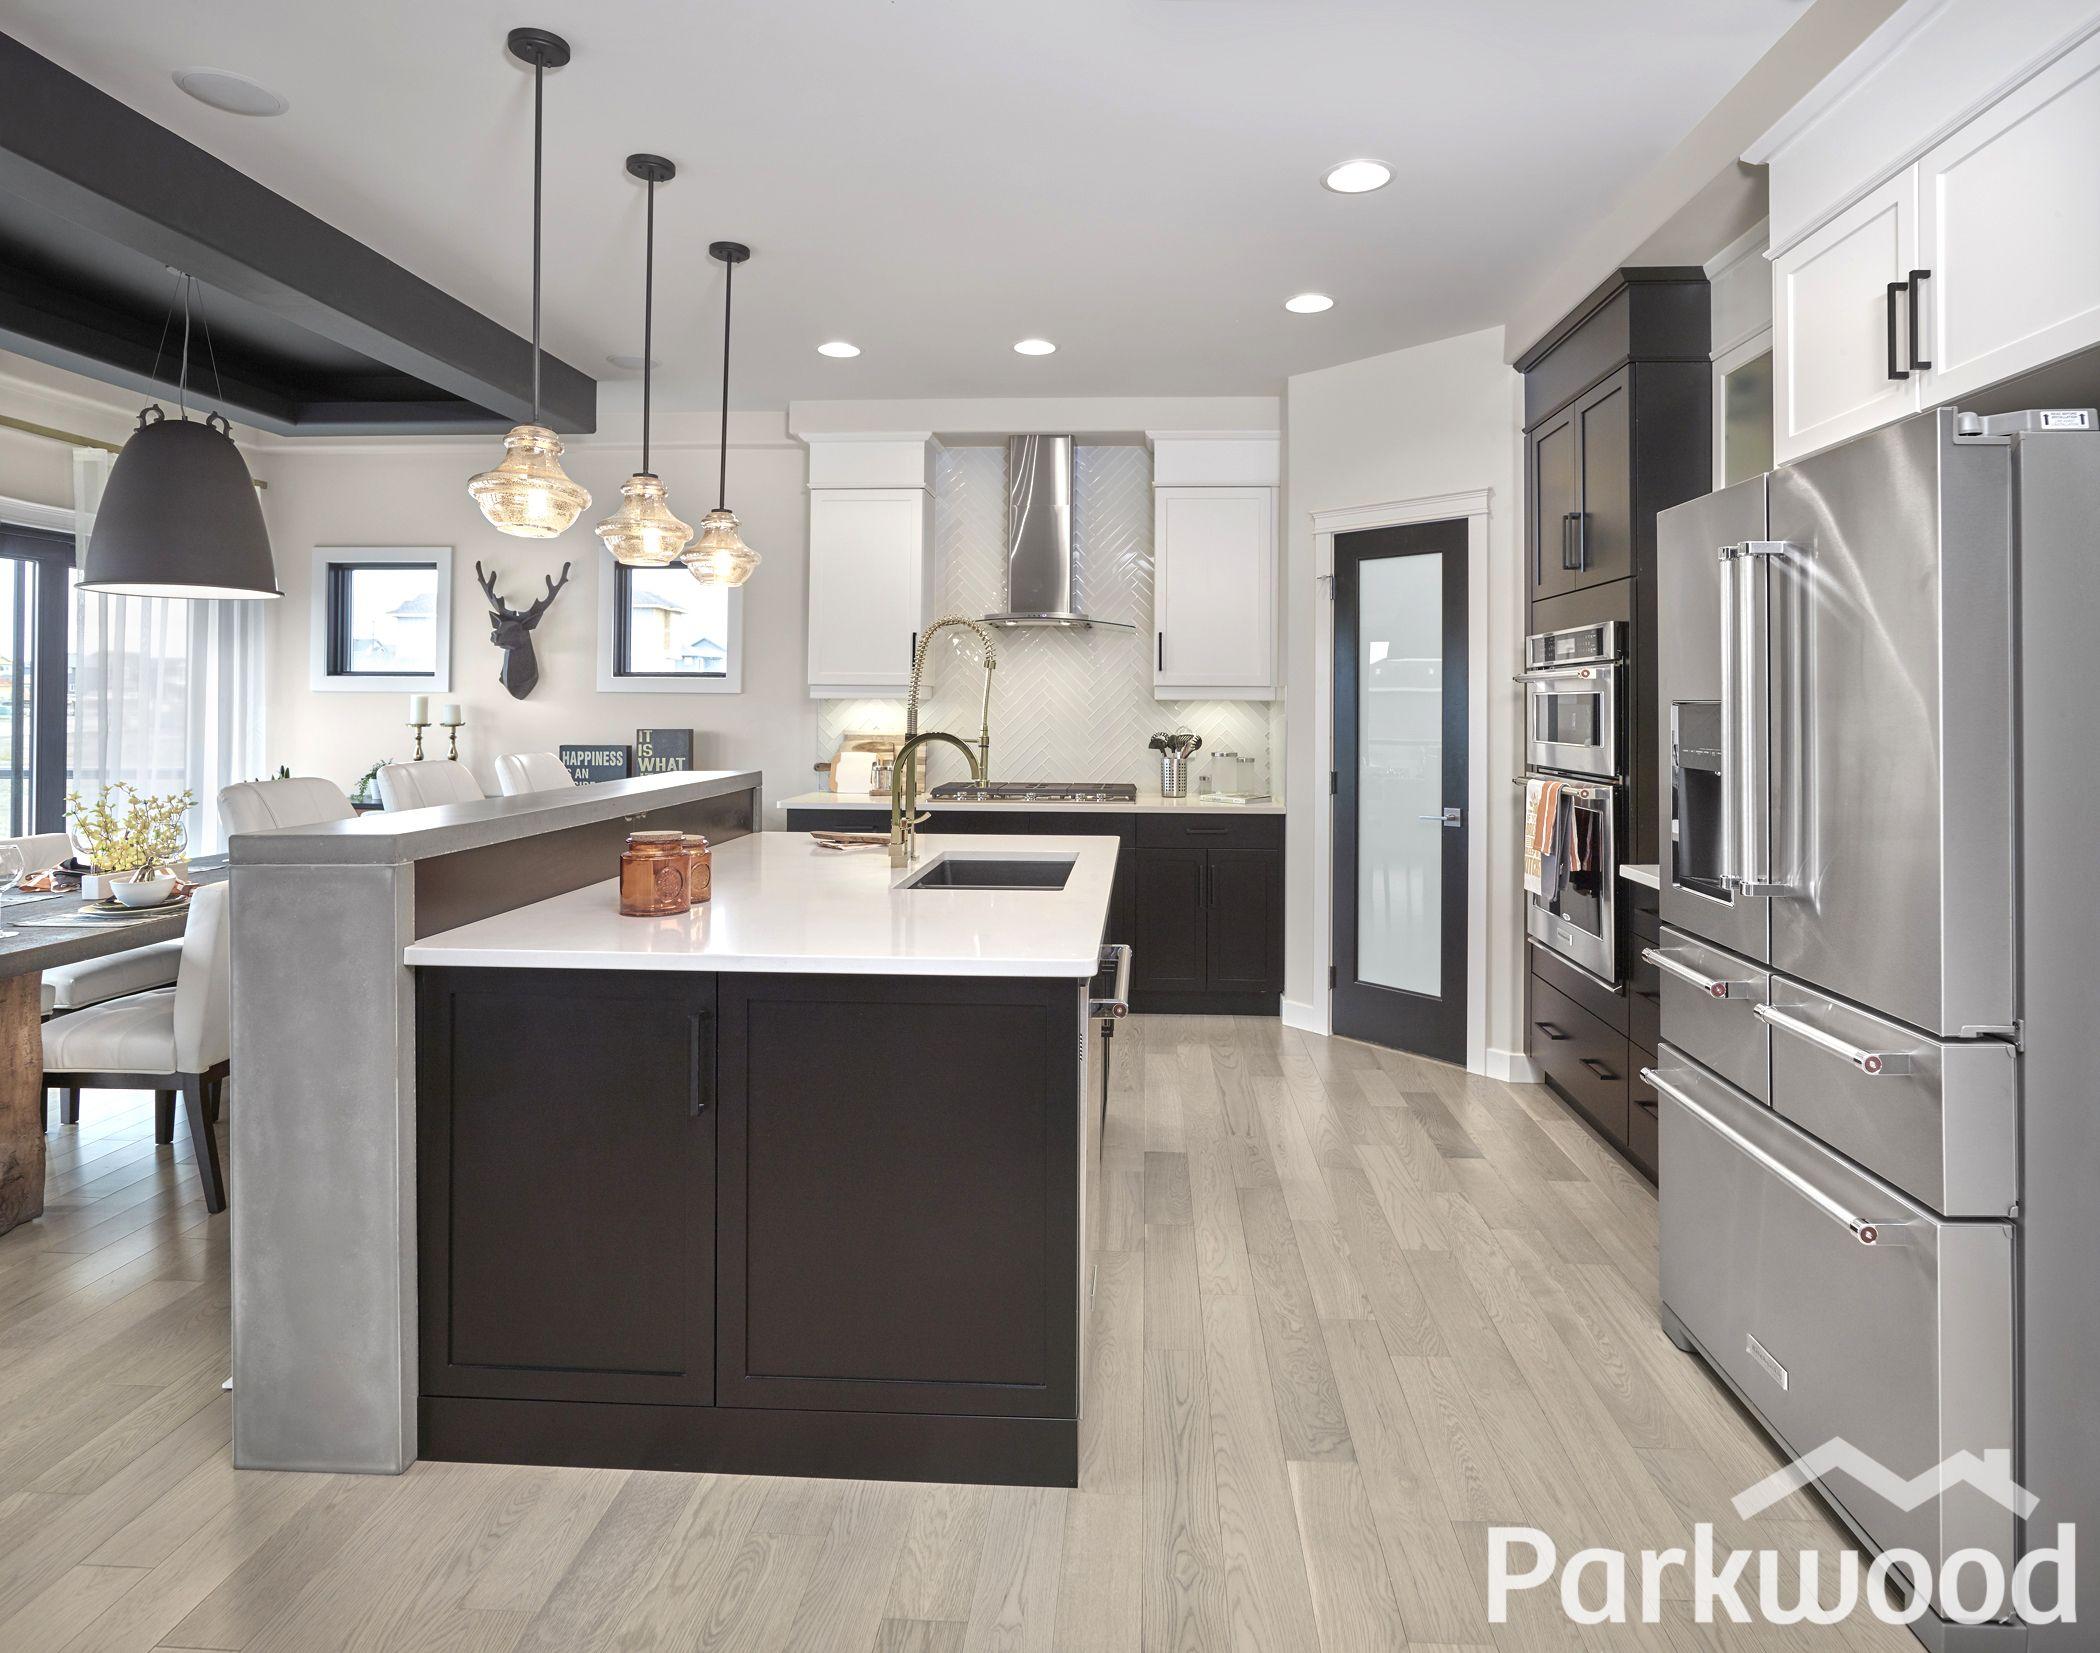 Avalon iii in aurora kitchen cabinets ideas pinterest kitchens avalon iii in aurora malvernweather Images